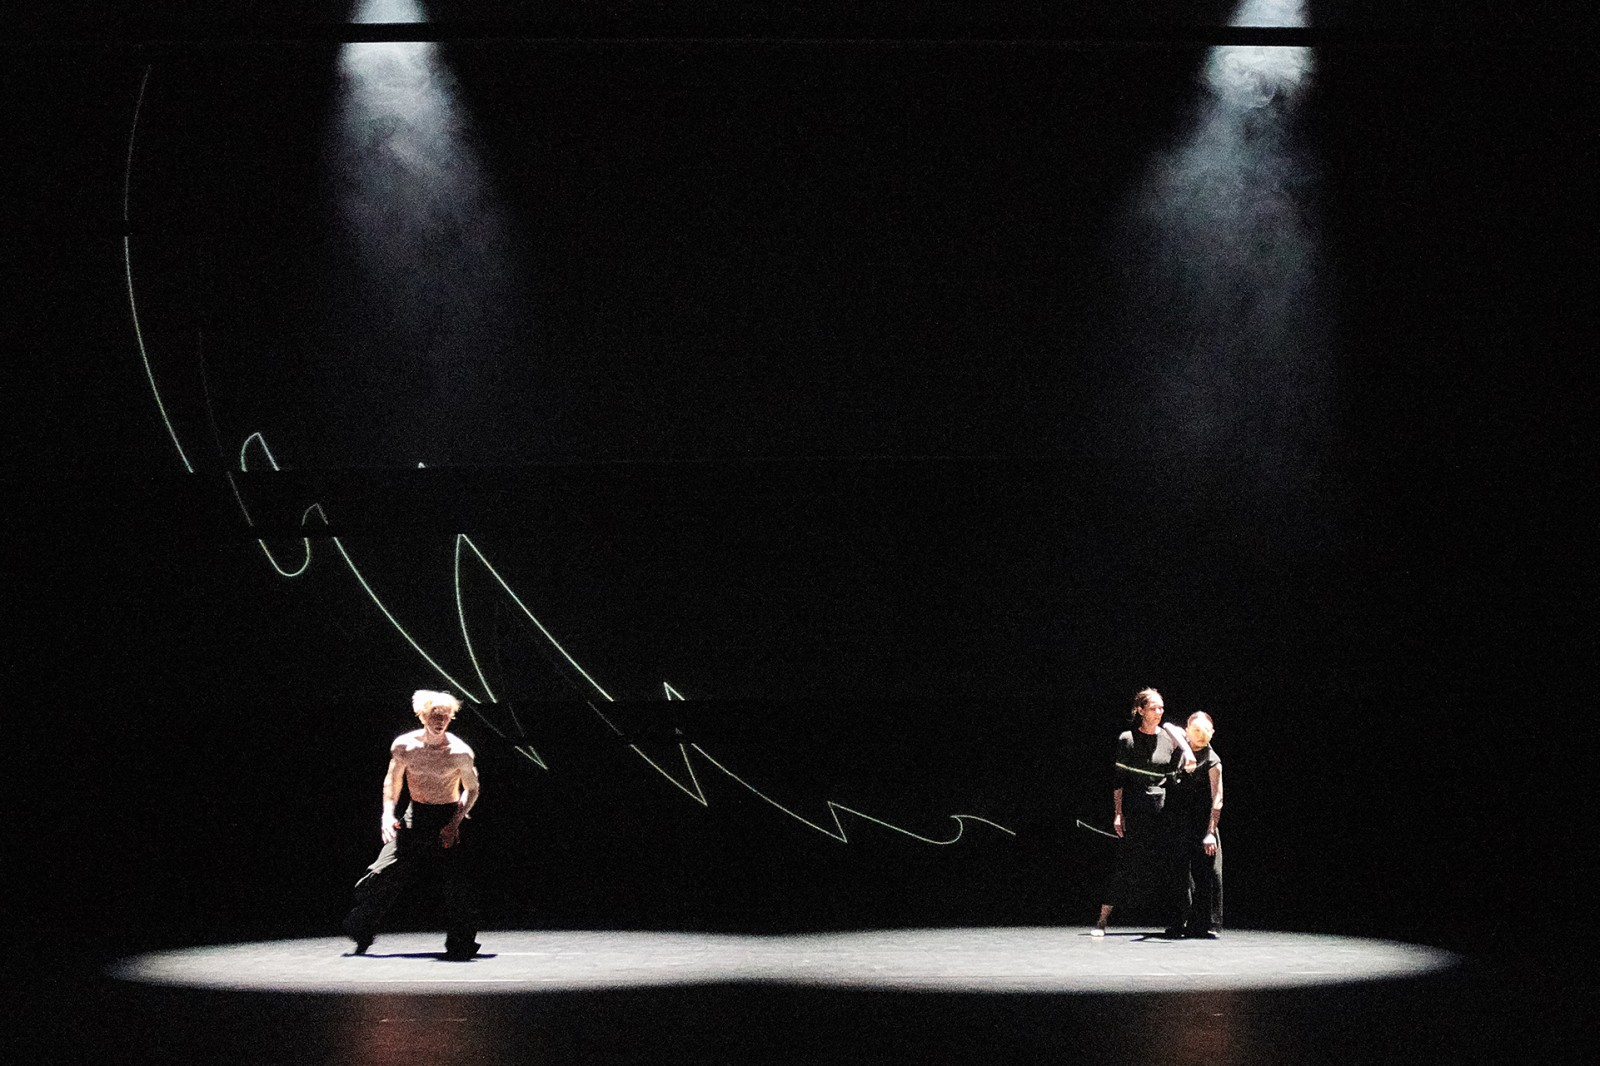 Guido Dutilh, Kotono Choda & Igone de Jongh ©Peter Bilak http://make-move-think.org/